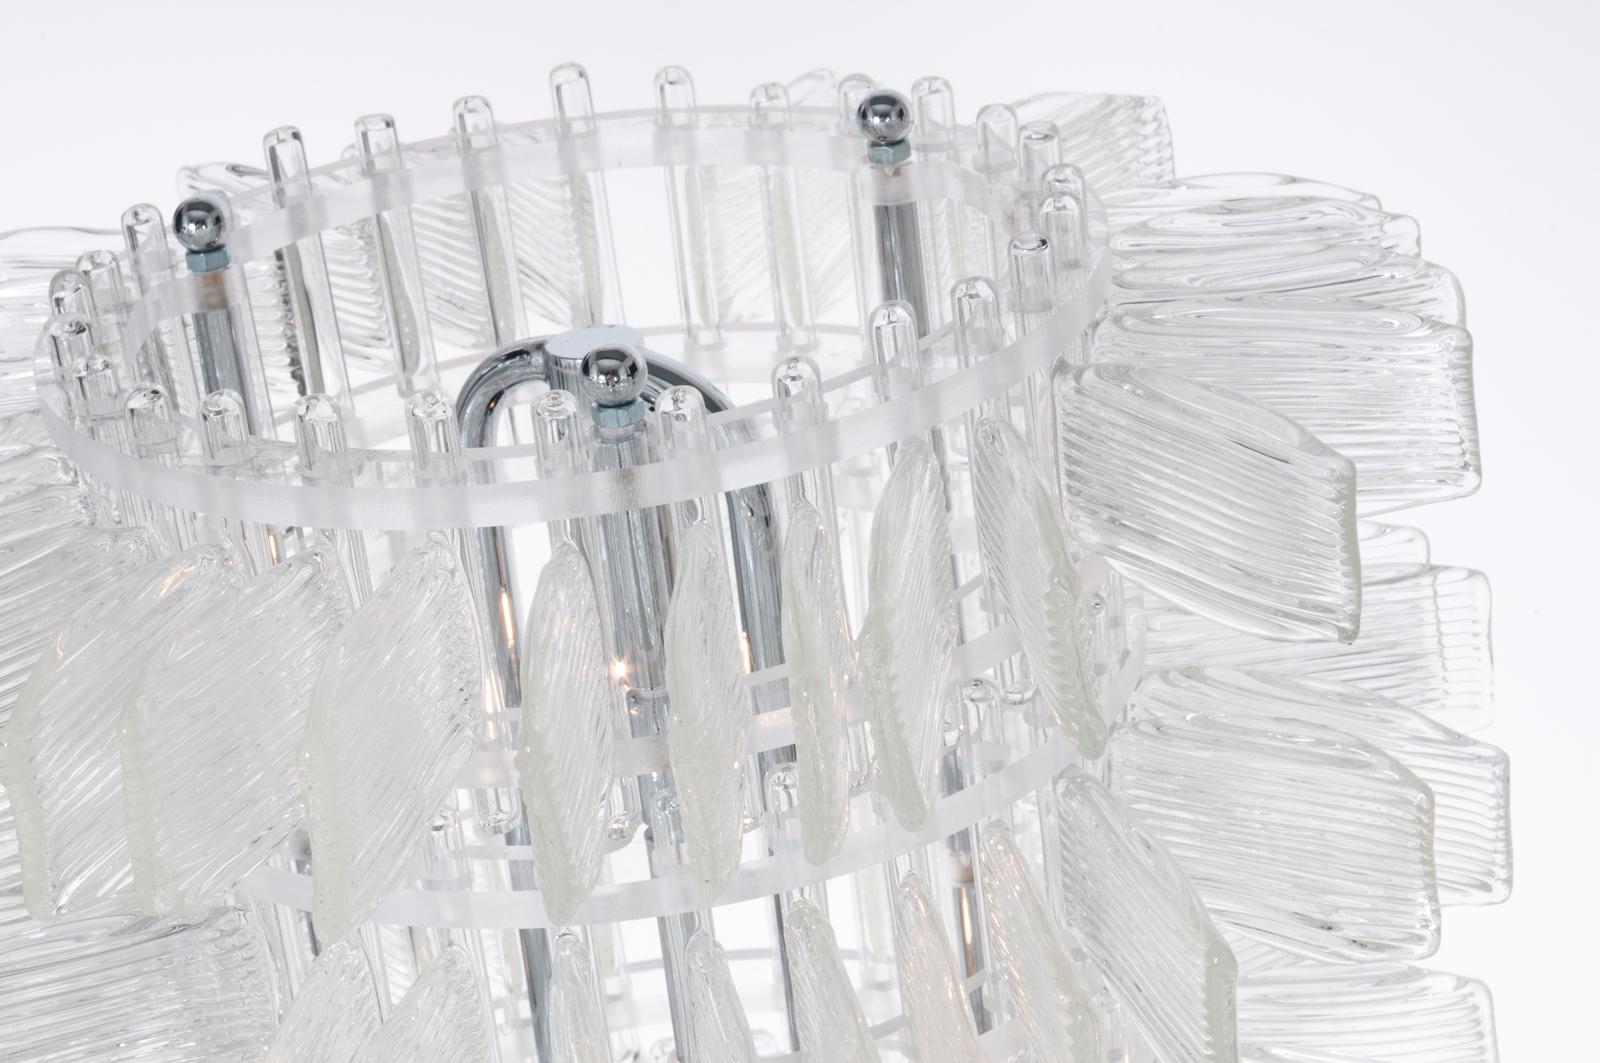 anemone-32-table-chrome-cristal-crystal-veronese-maurizio-galante-tal-lancman-81.jpg